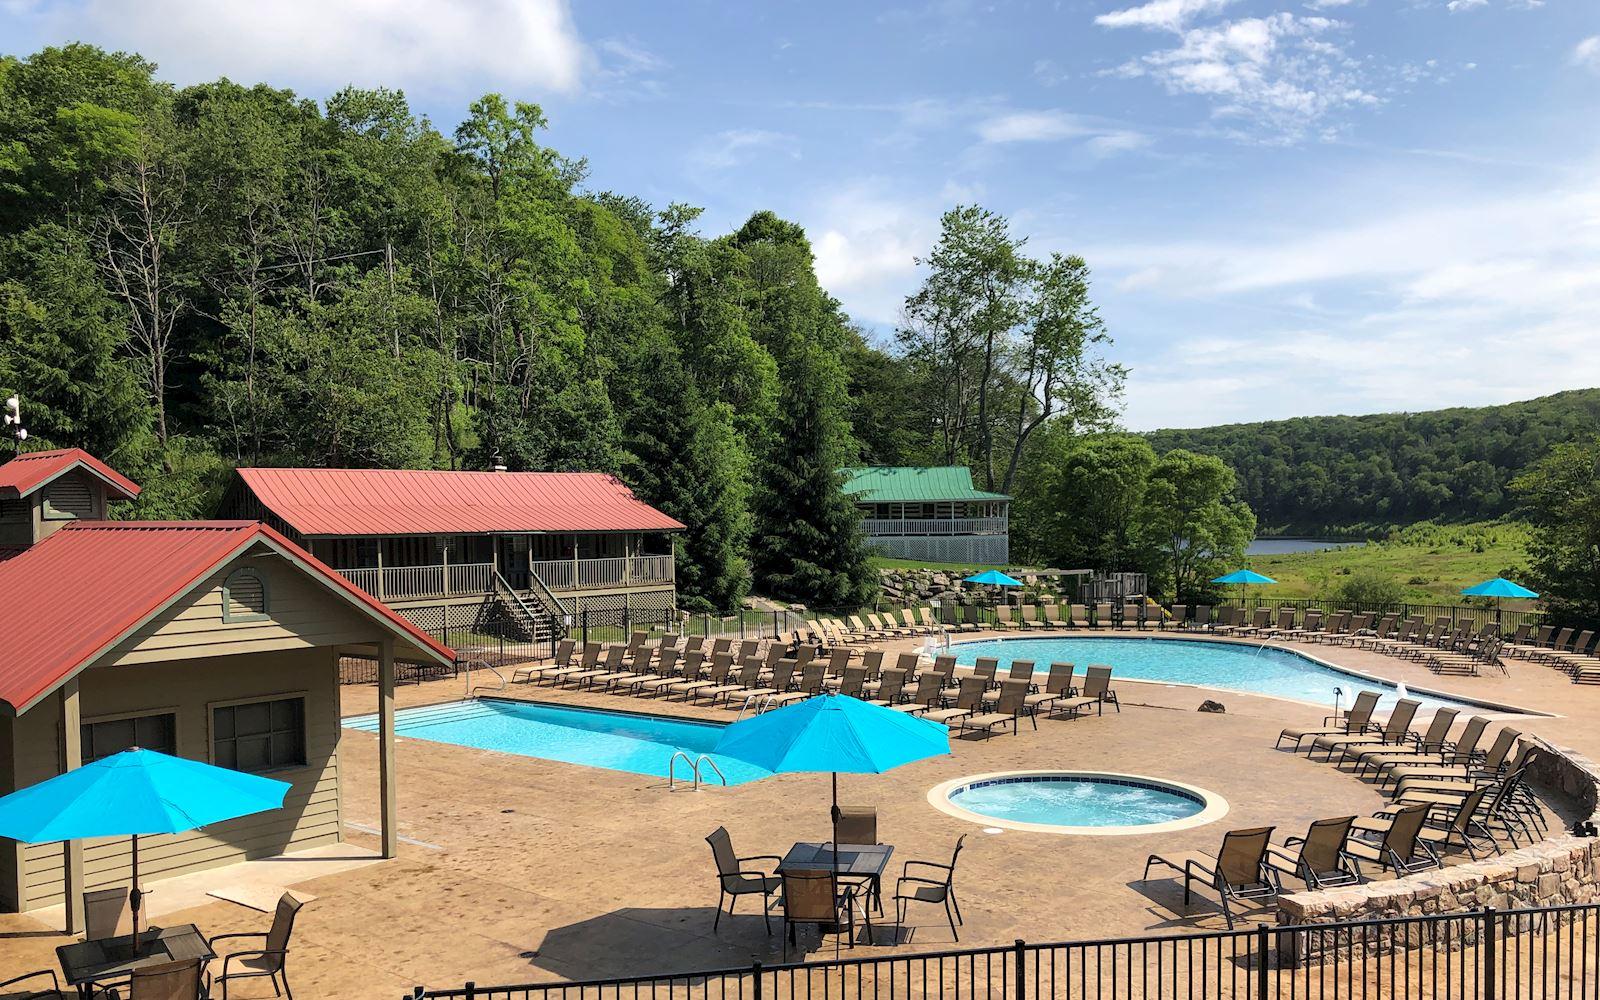 Mountain Attractions In Virginia - Mountain Lake Lodge